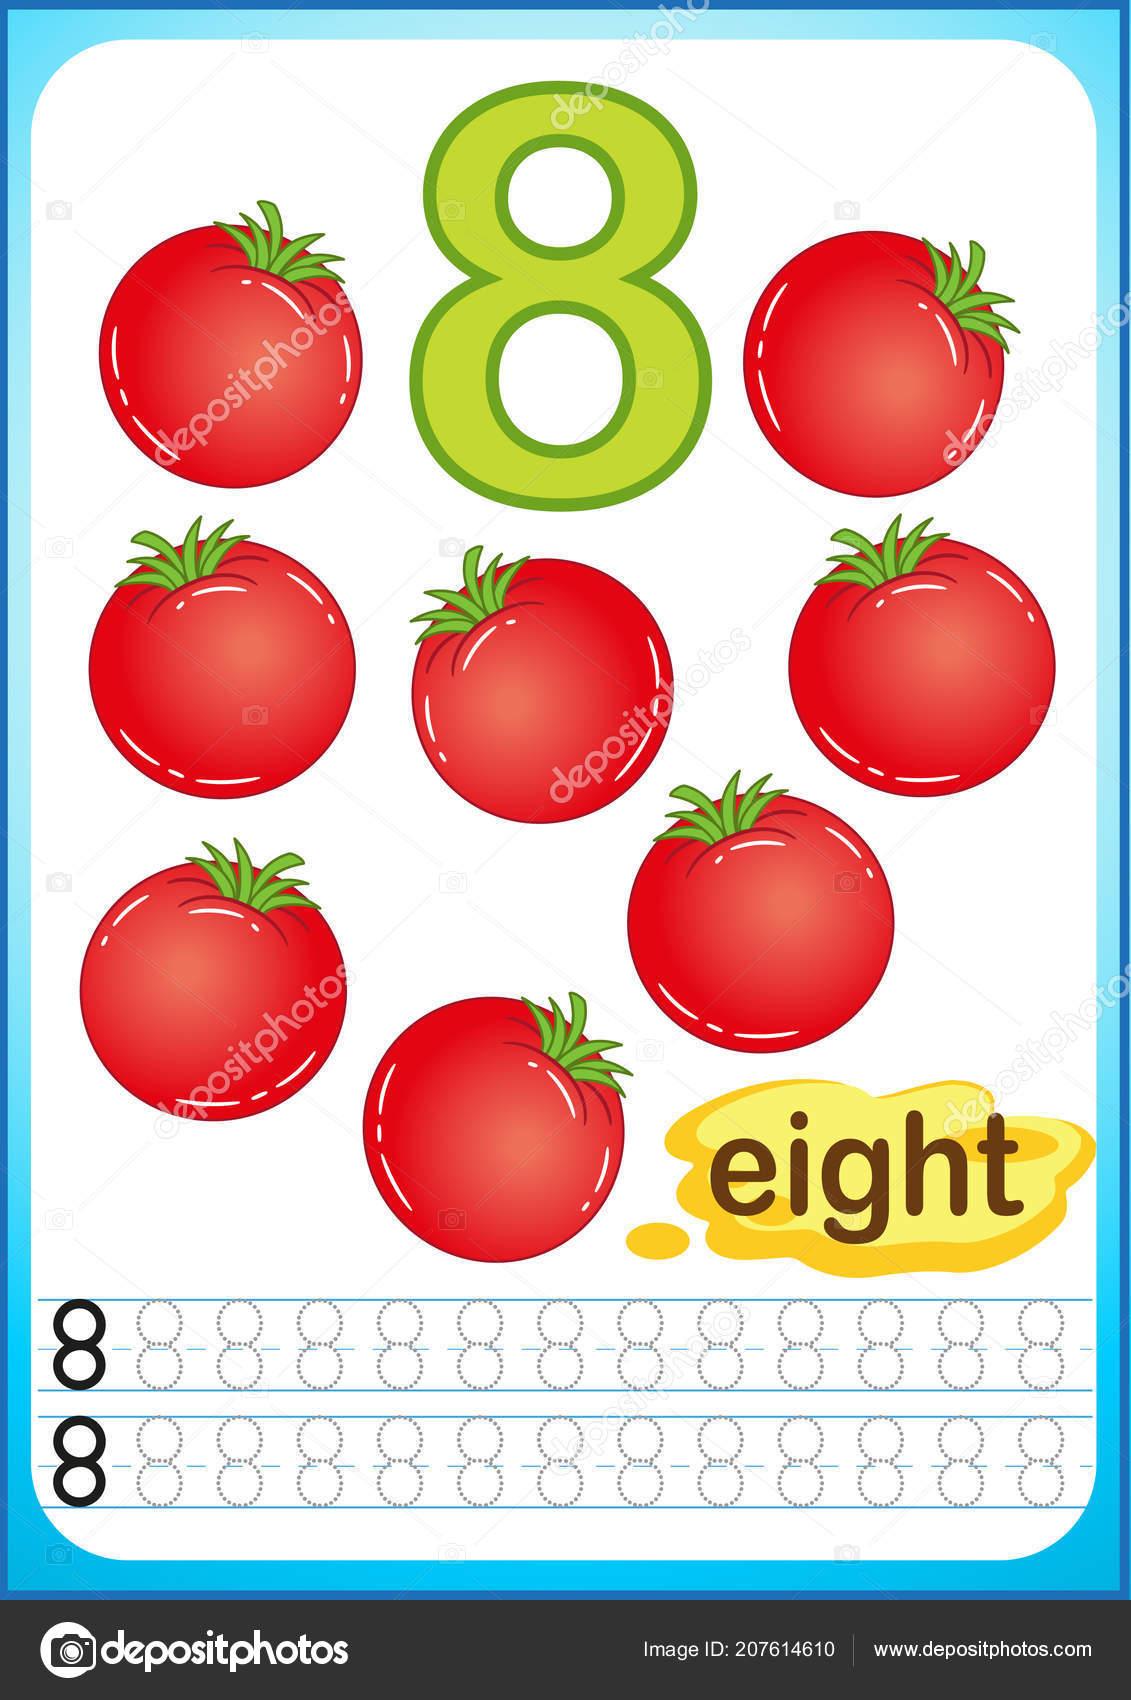 Printable Worksheet Kindergarten Preschool Exercises Writing Numbers Bright Vegetable Harvest Vector Image By C Natasha Tpr Vector Stock 207614610 - 23+ Writing Numbers Worksheets For Kindergarten Background